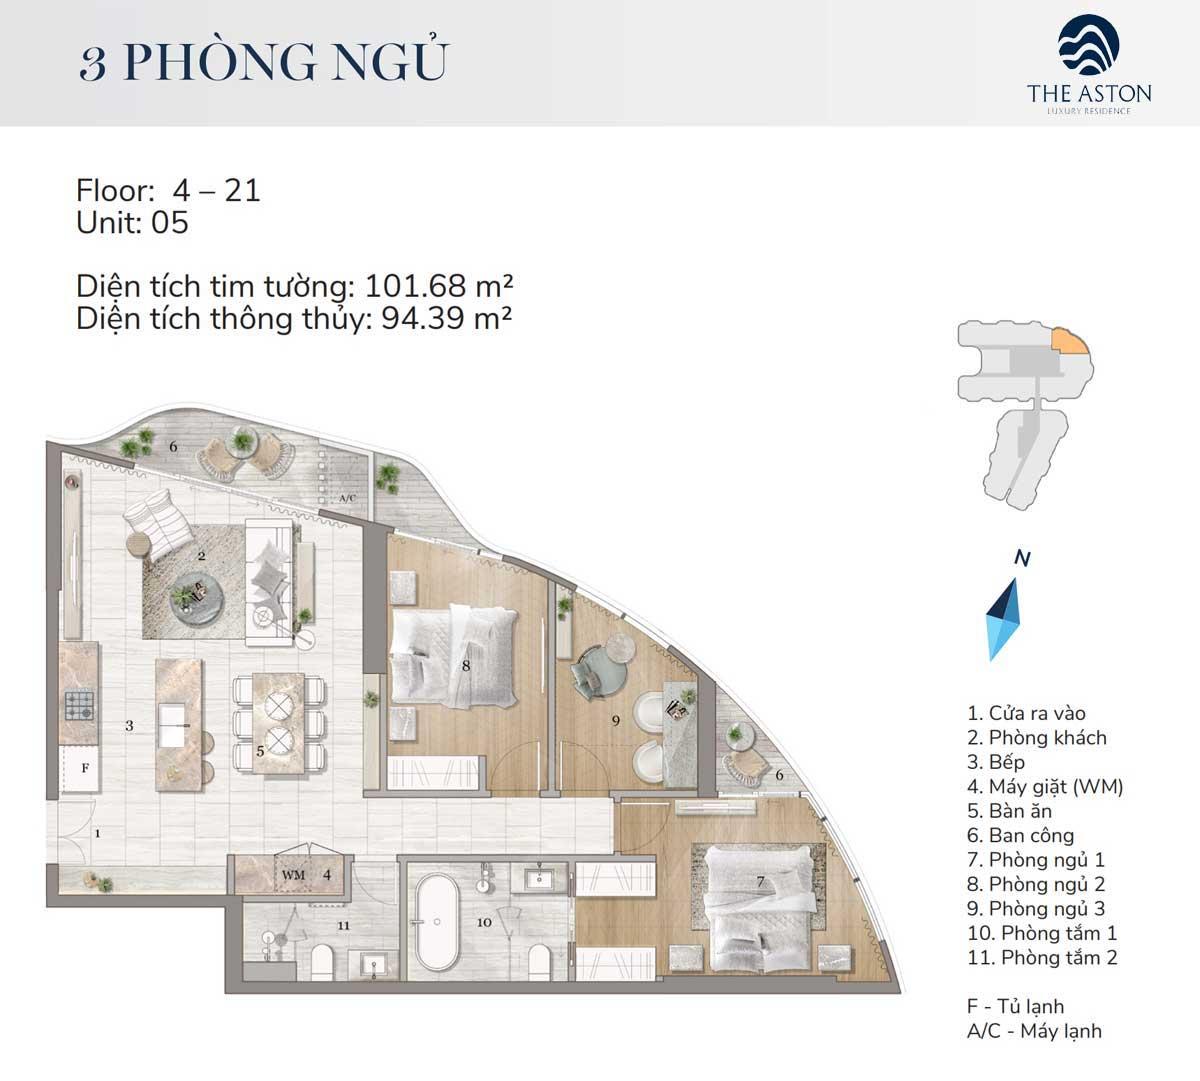 thiet ke can ho 3 phong ngu the aston luxury residence nha trang - THE ASTON LUXURY RESIDENCE NHA TRANG